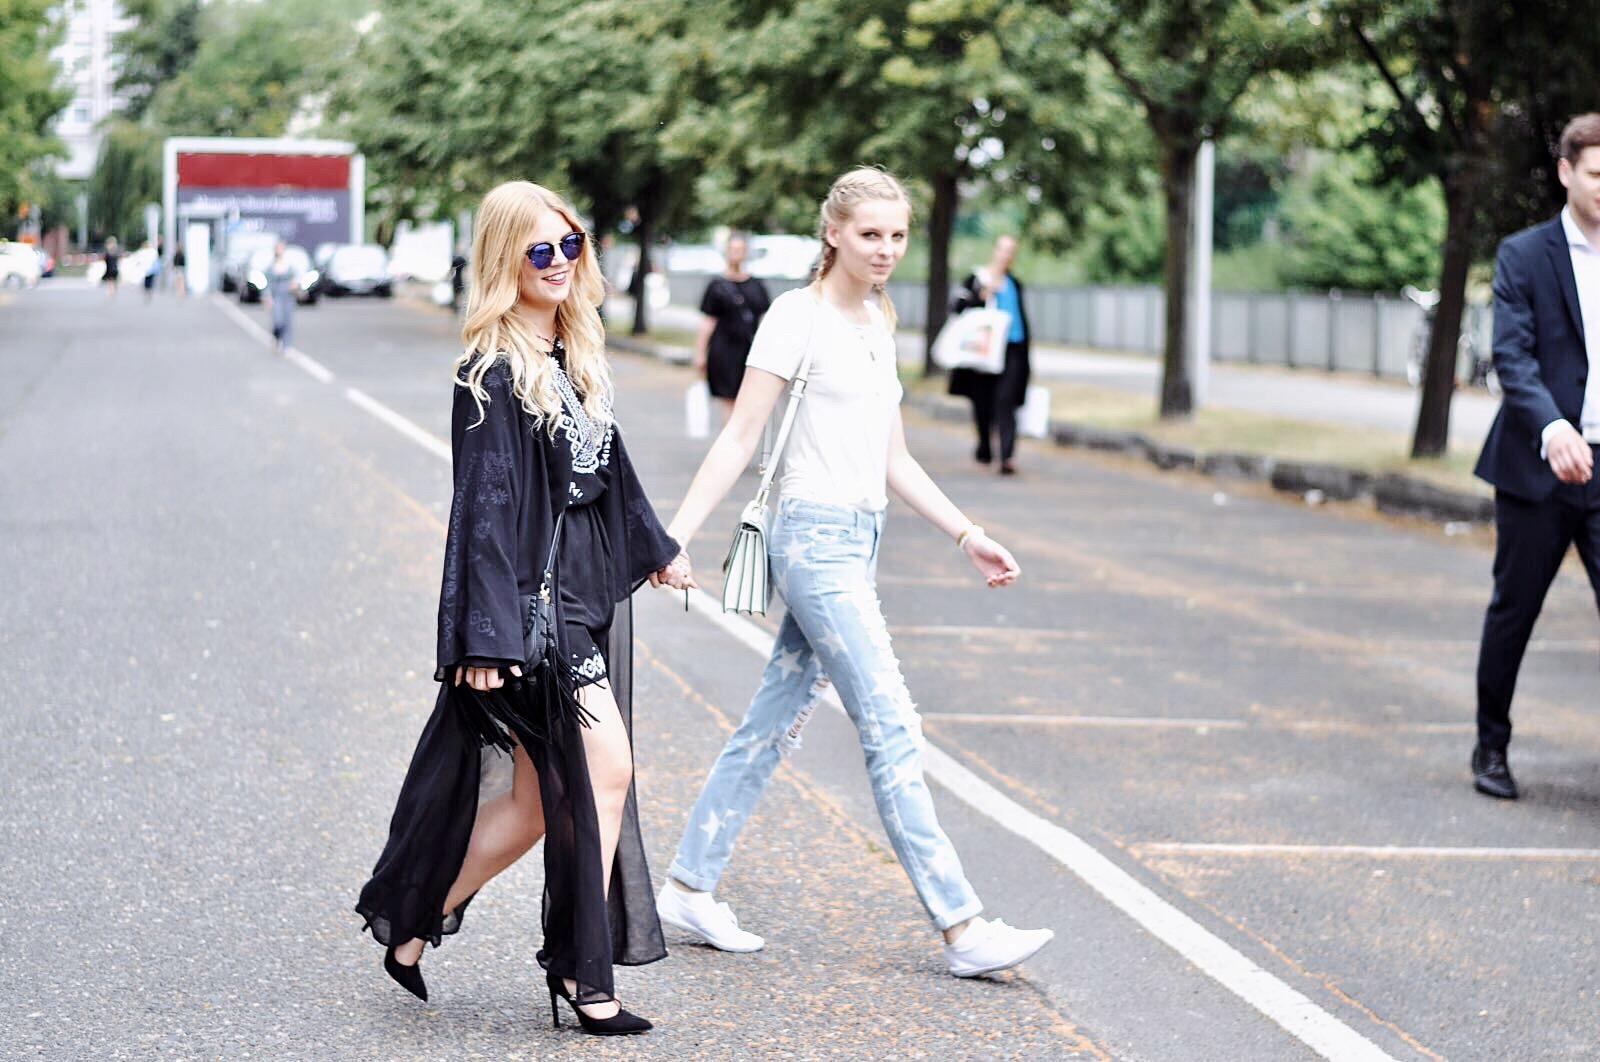 fashion_week_berlin_itsgoldie_mbfwb_2016_sommer_modeblogger_fashionblogger